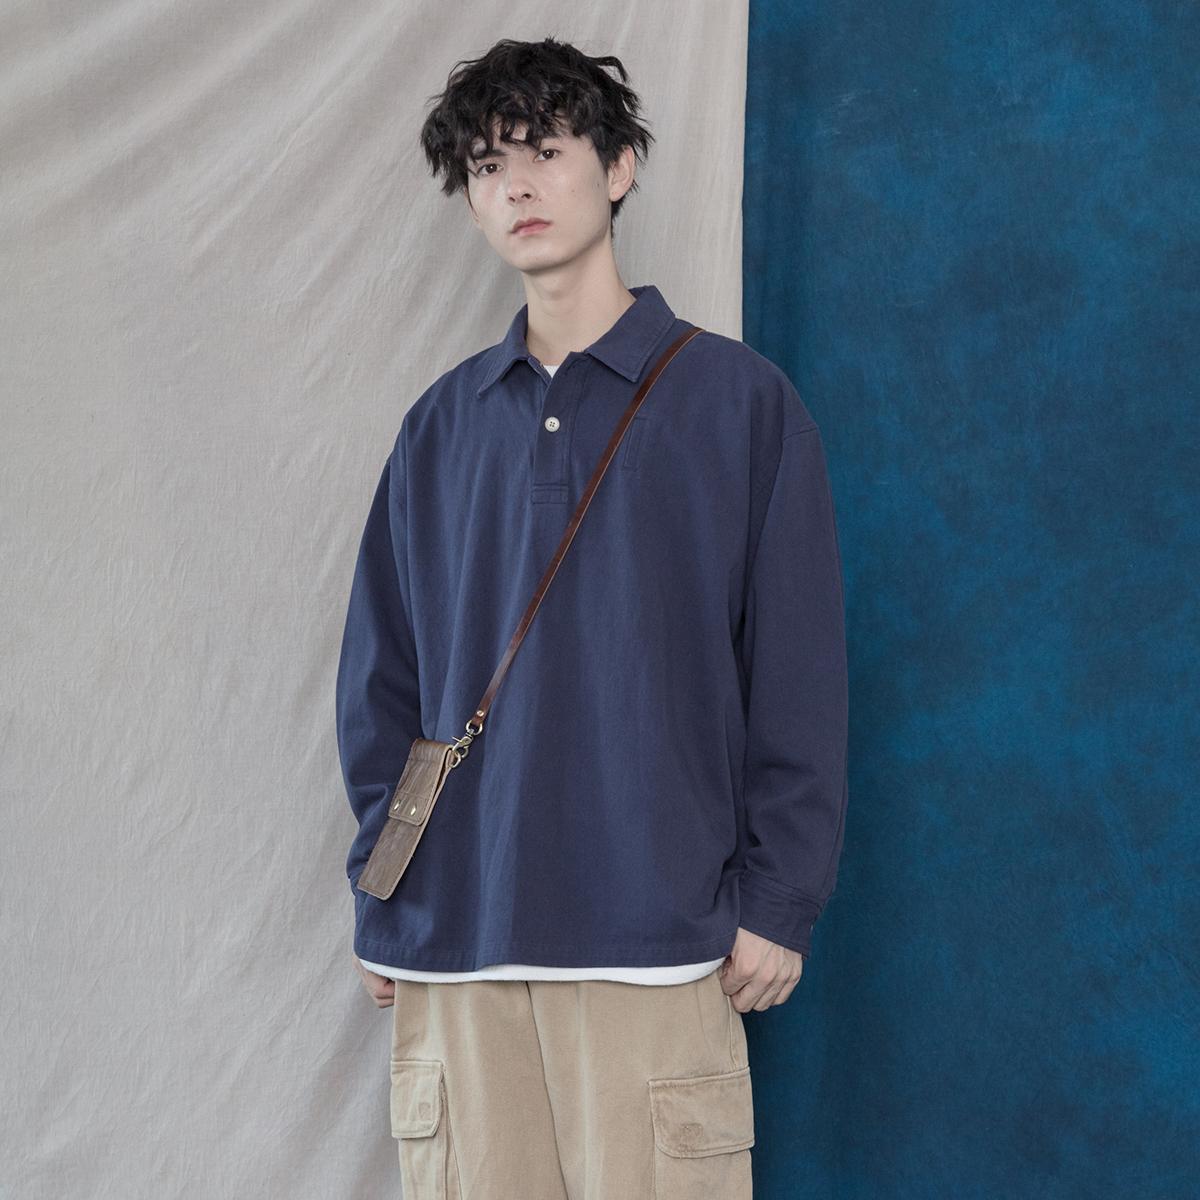 Мужские футболки Артикул 606945153781